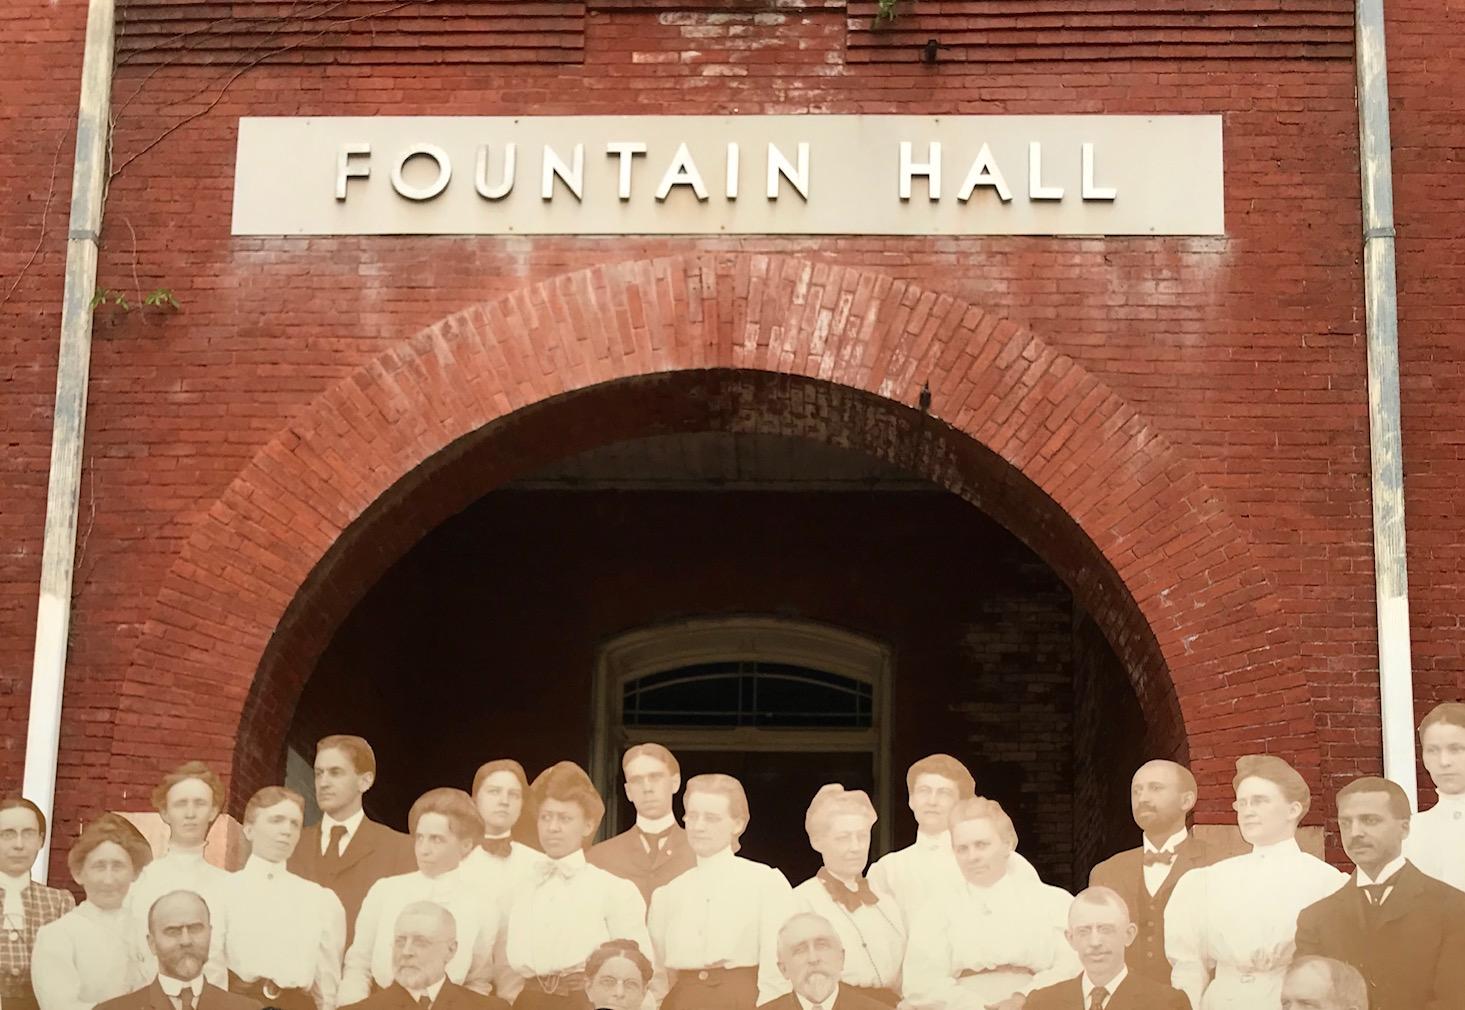 FountainHall_20